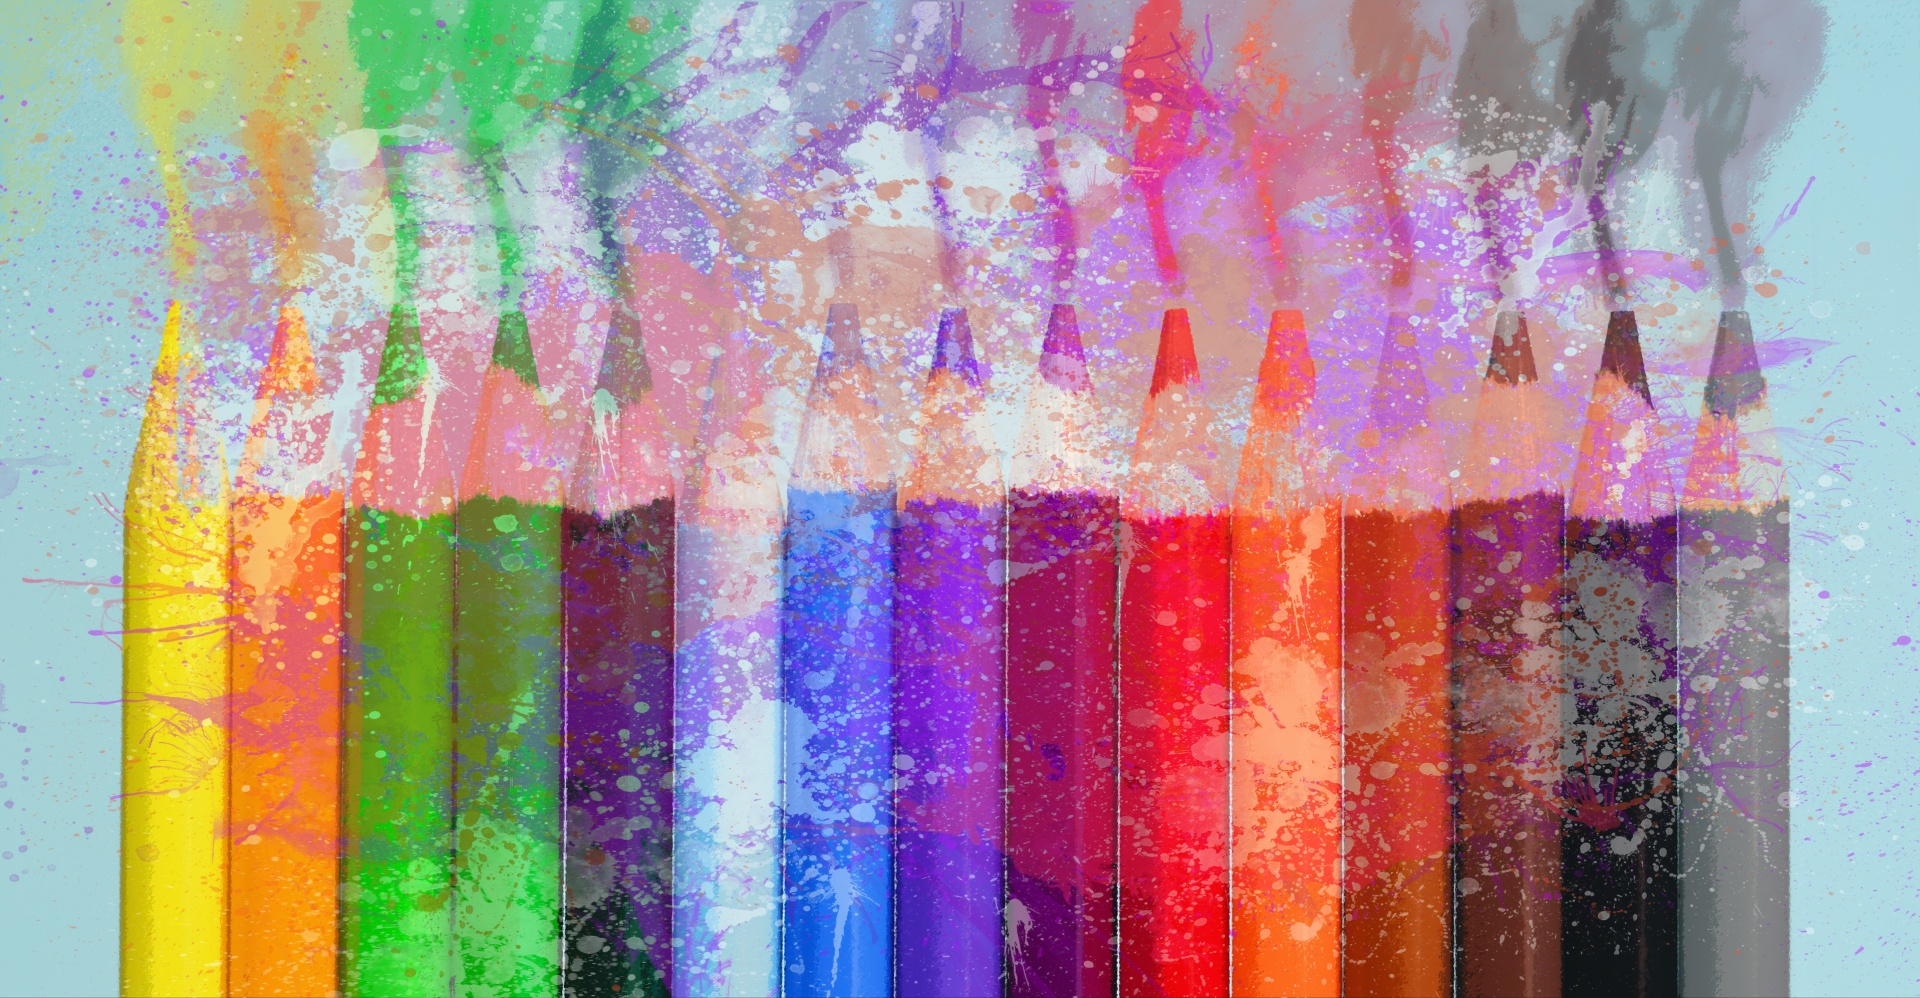 Crayons Watercolor Splash Free Stock Photo  Public Domain